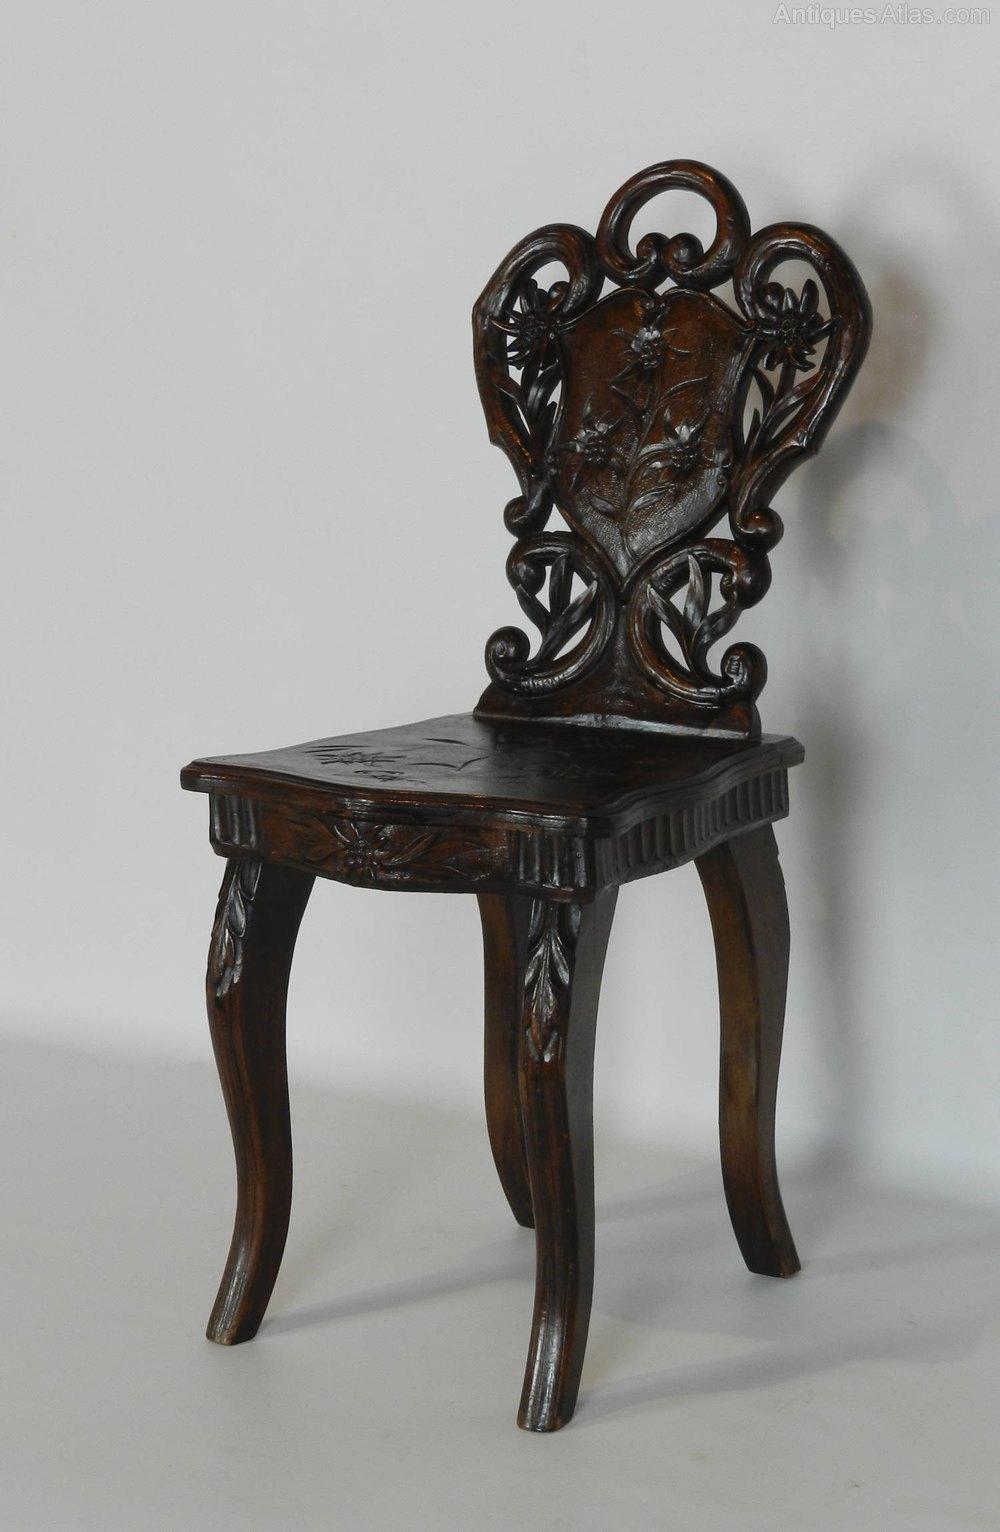 Small Antique Musical Chair Antiques Atlas